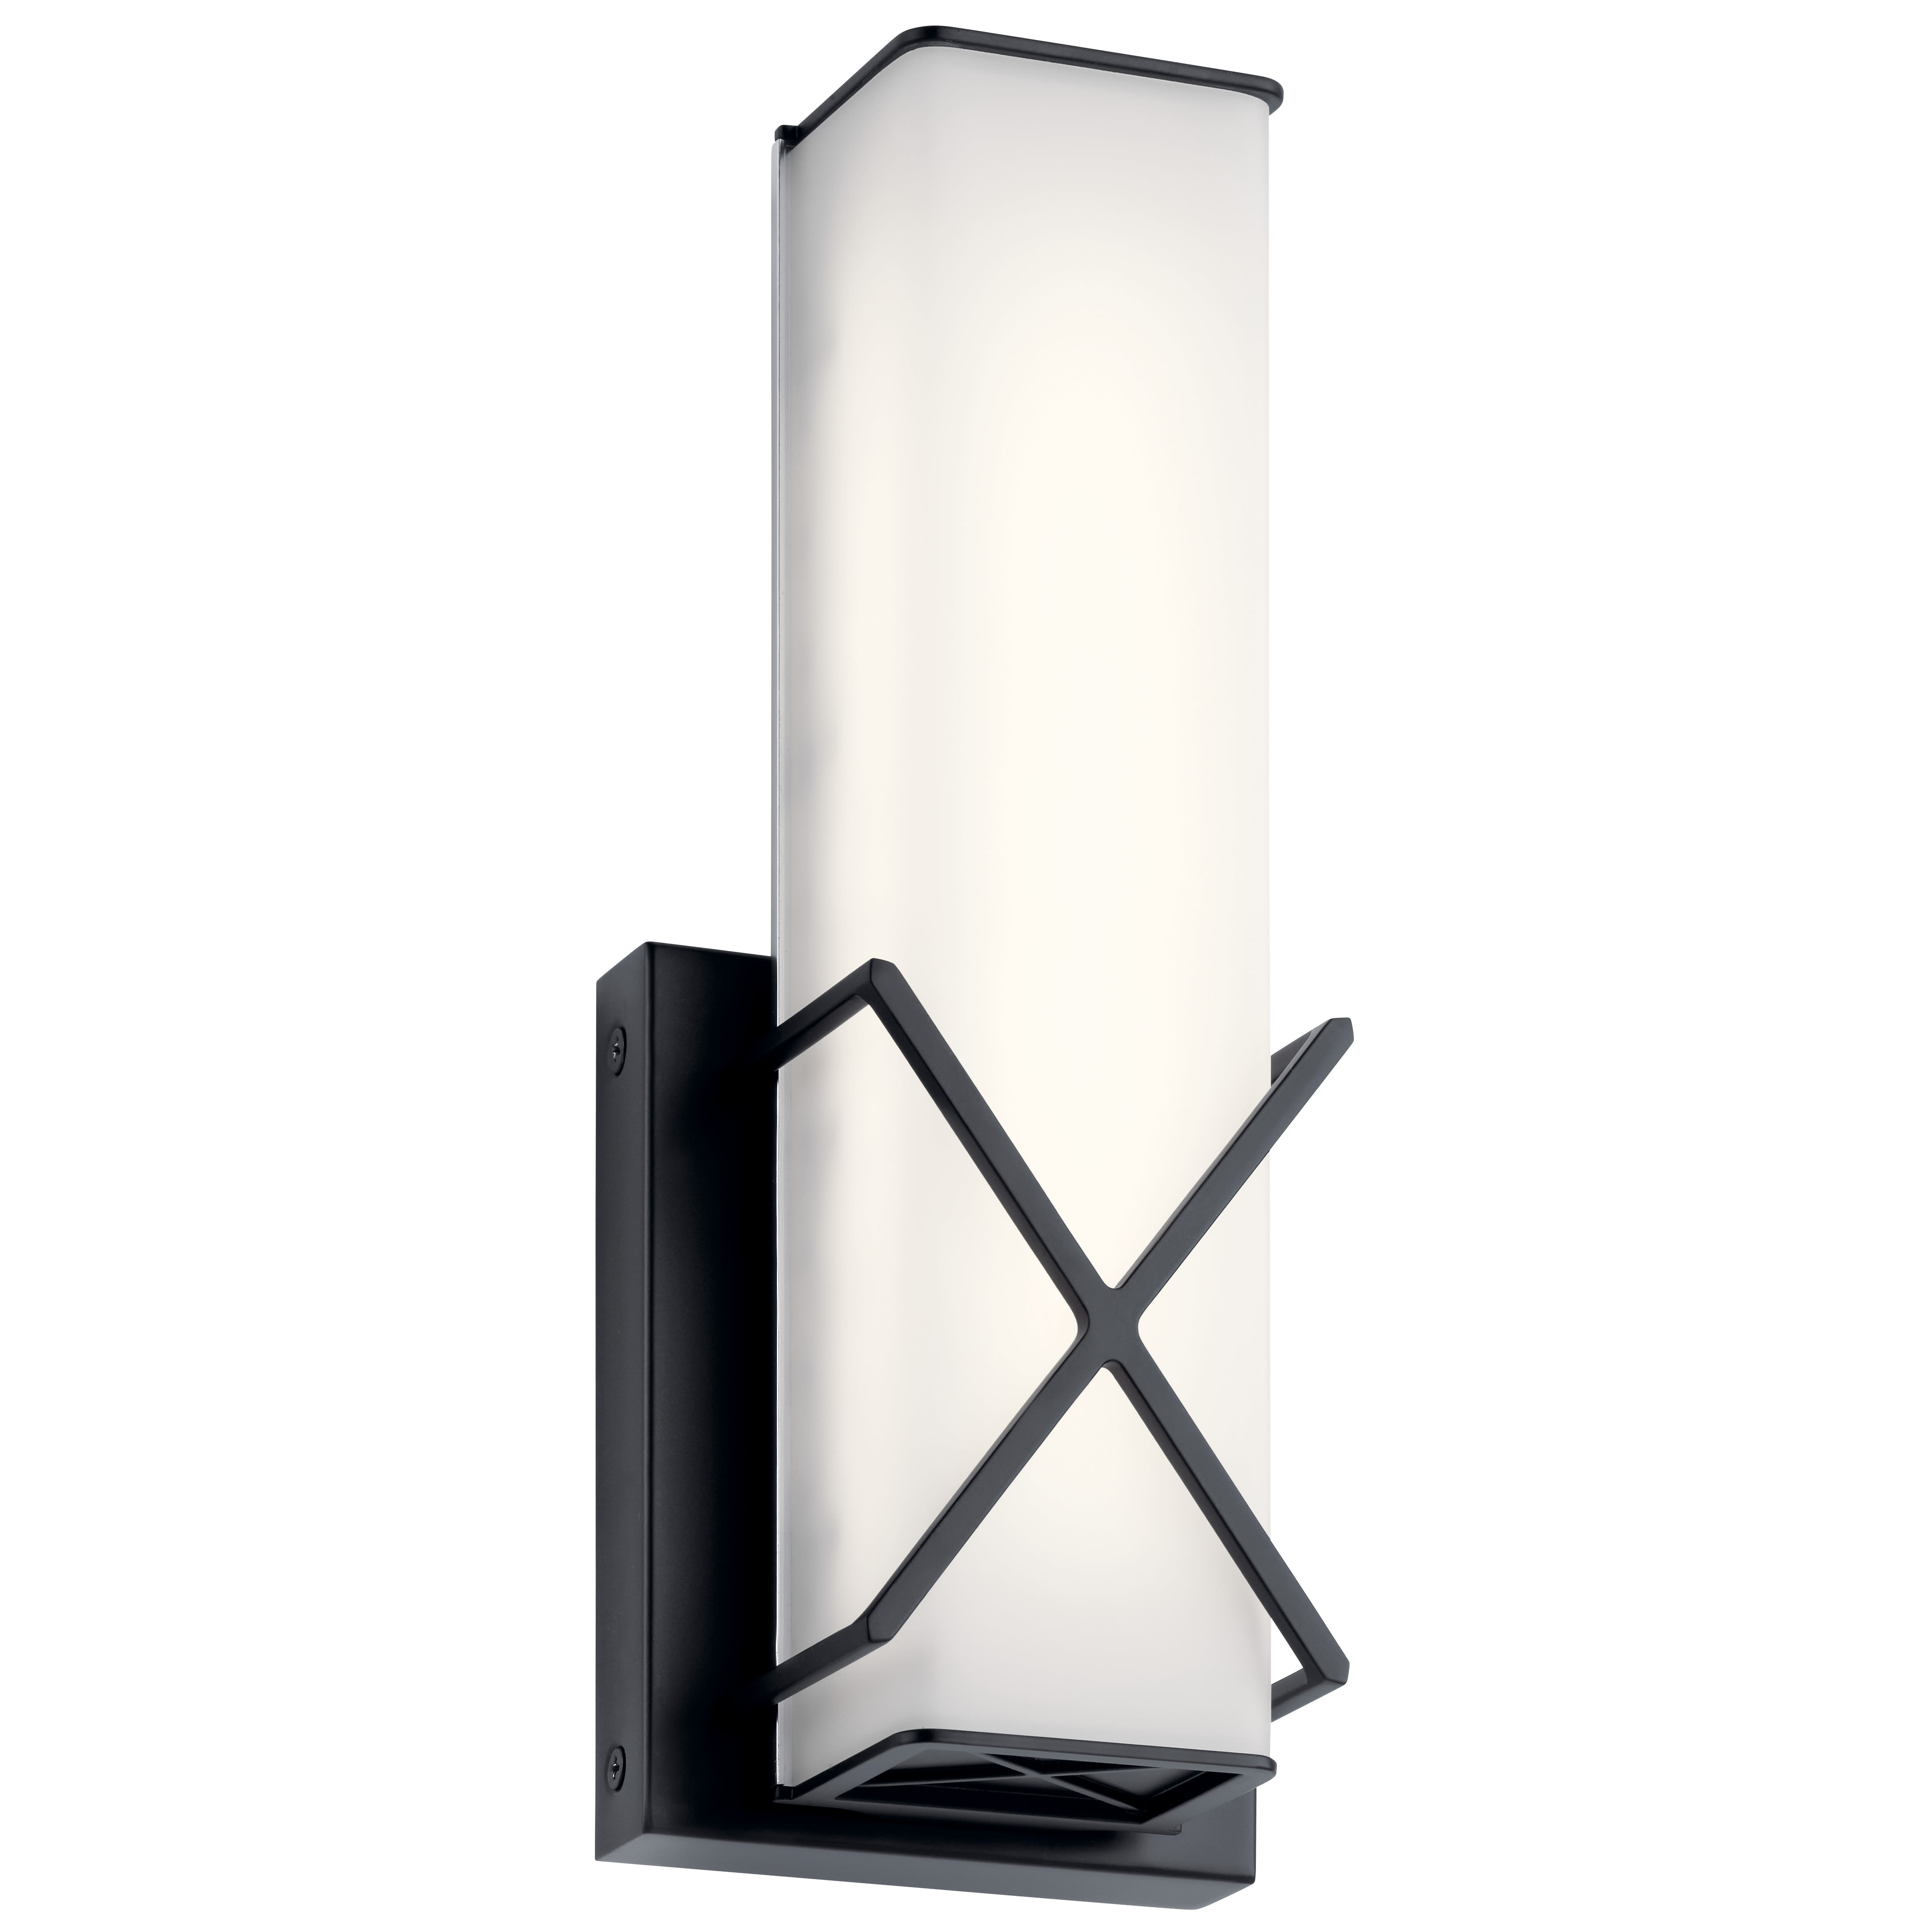 Image of: Kichler 45656mbkled Matte Black Trinsic 12 Tall Led Ada Bathroom Sconce Faucetdirect Com